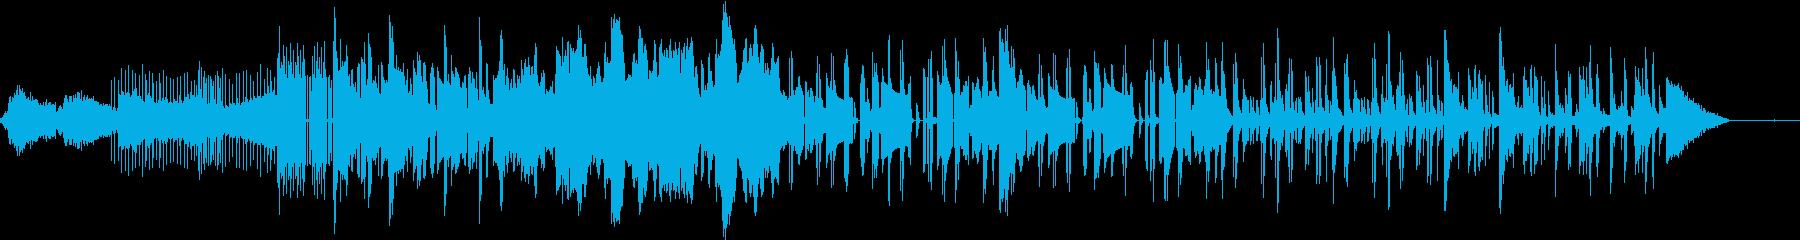 Hip Hop Beatのチルい曲の再生済みの波形